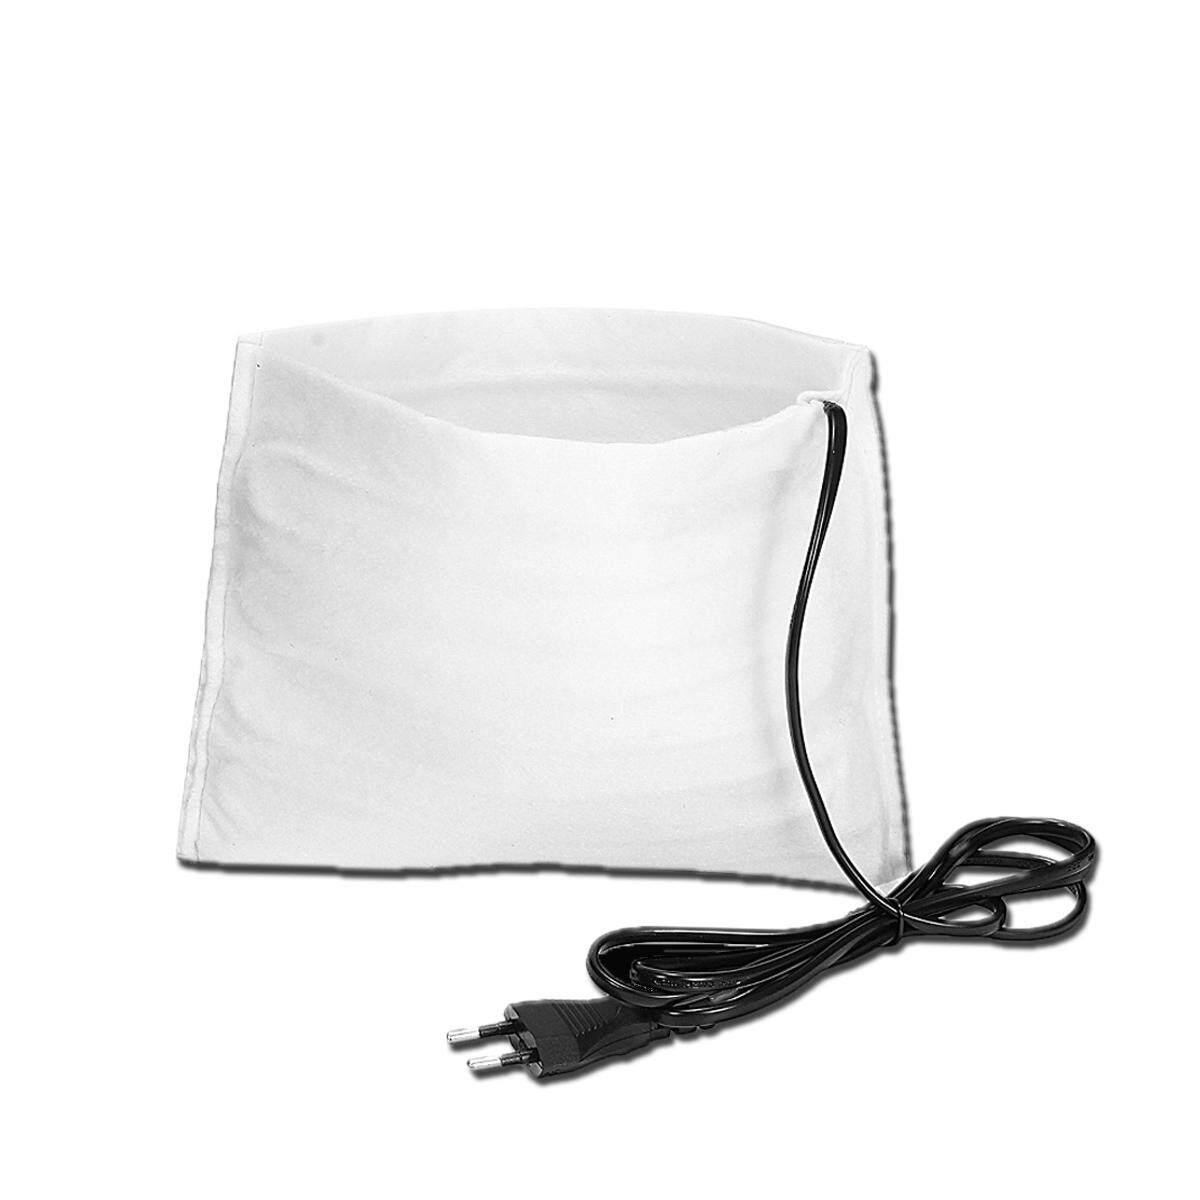 220V electric Stone massage Heater bag heating bag for hot energy lava spa massage